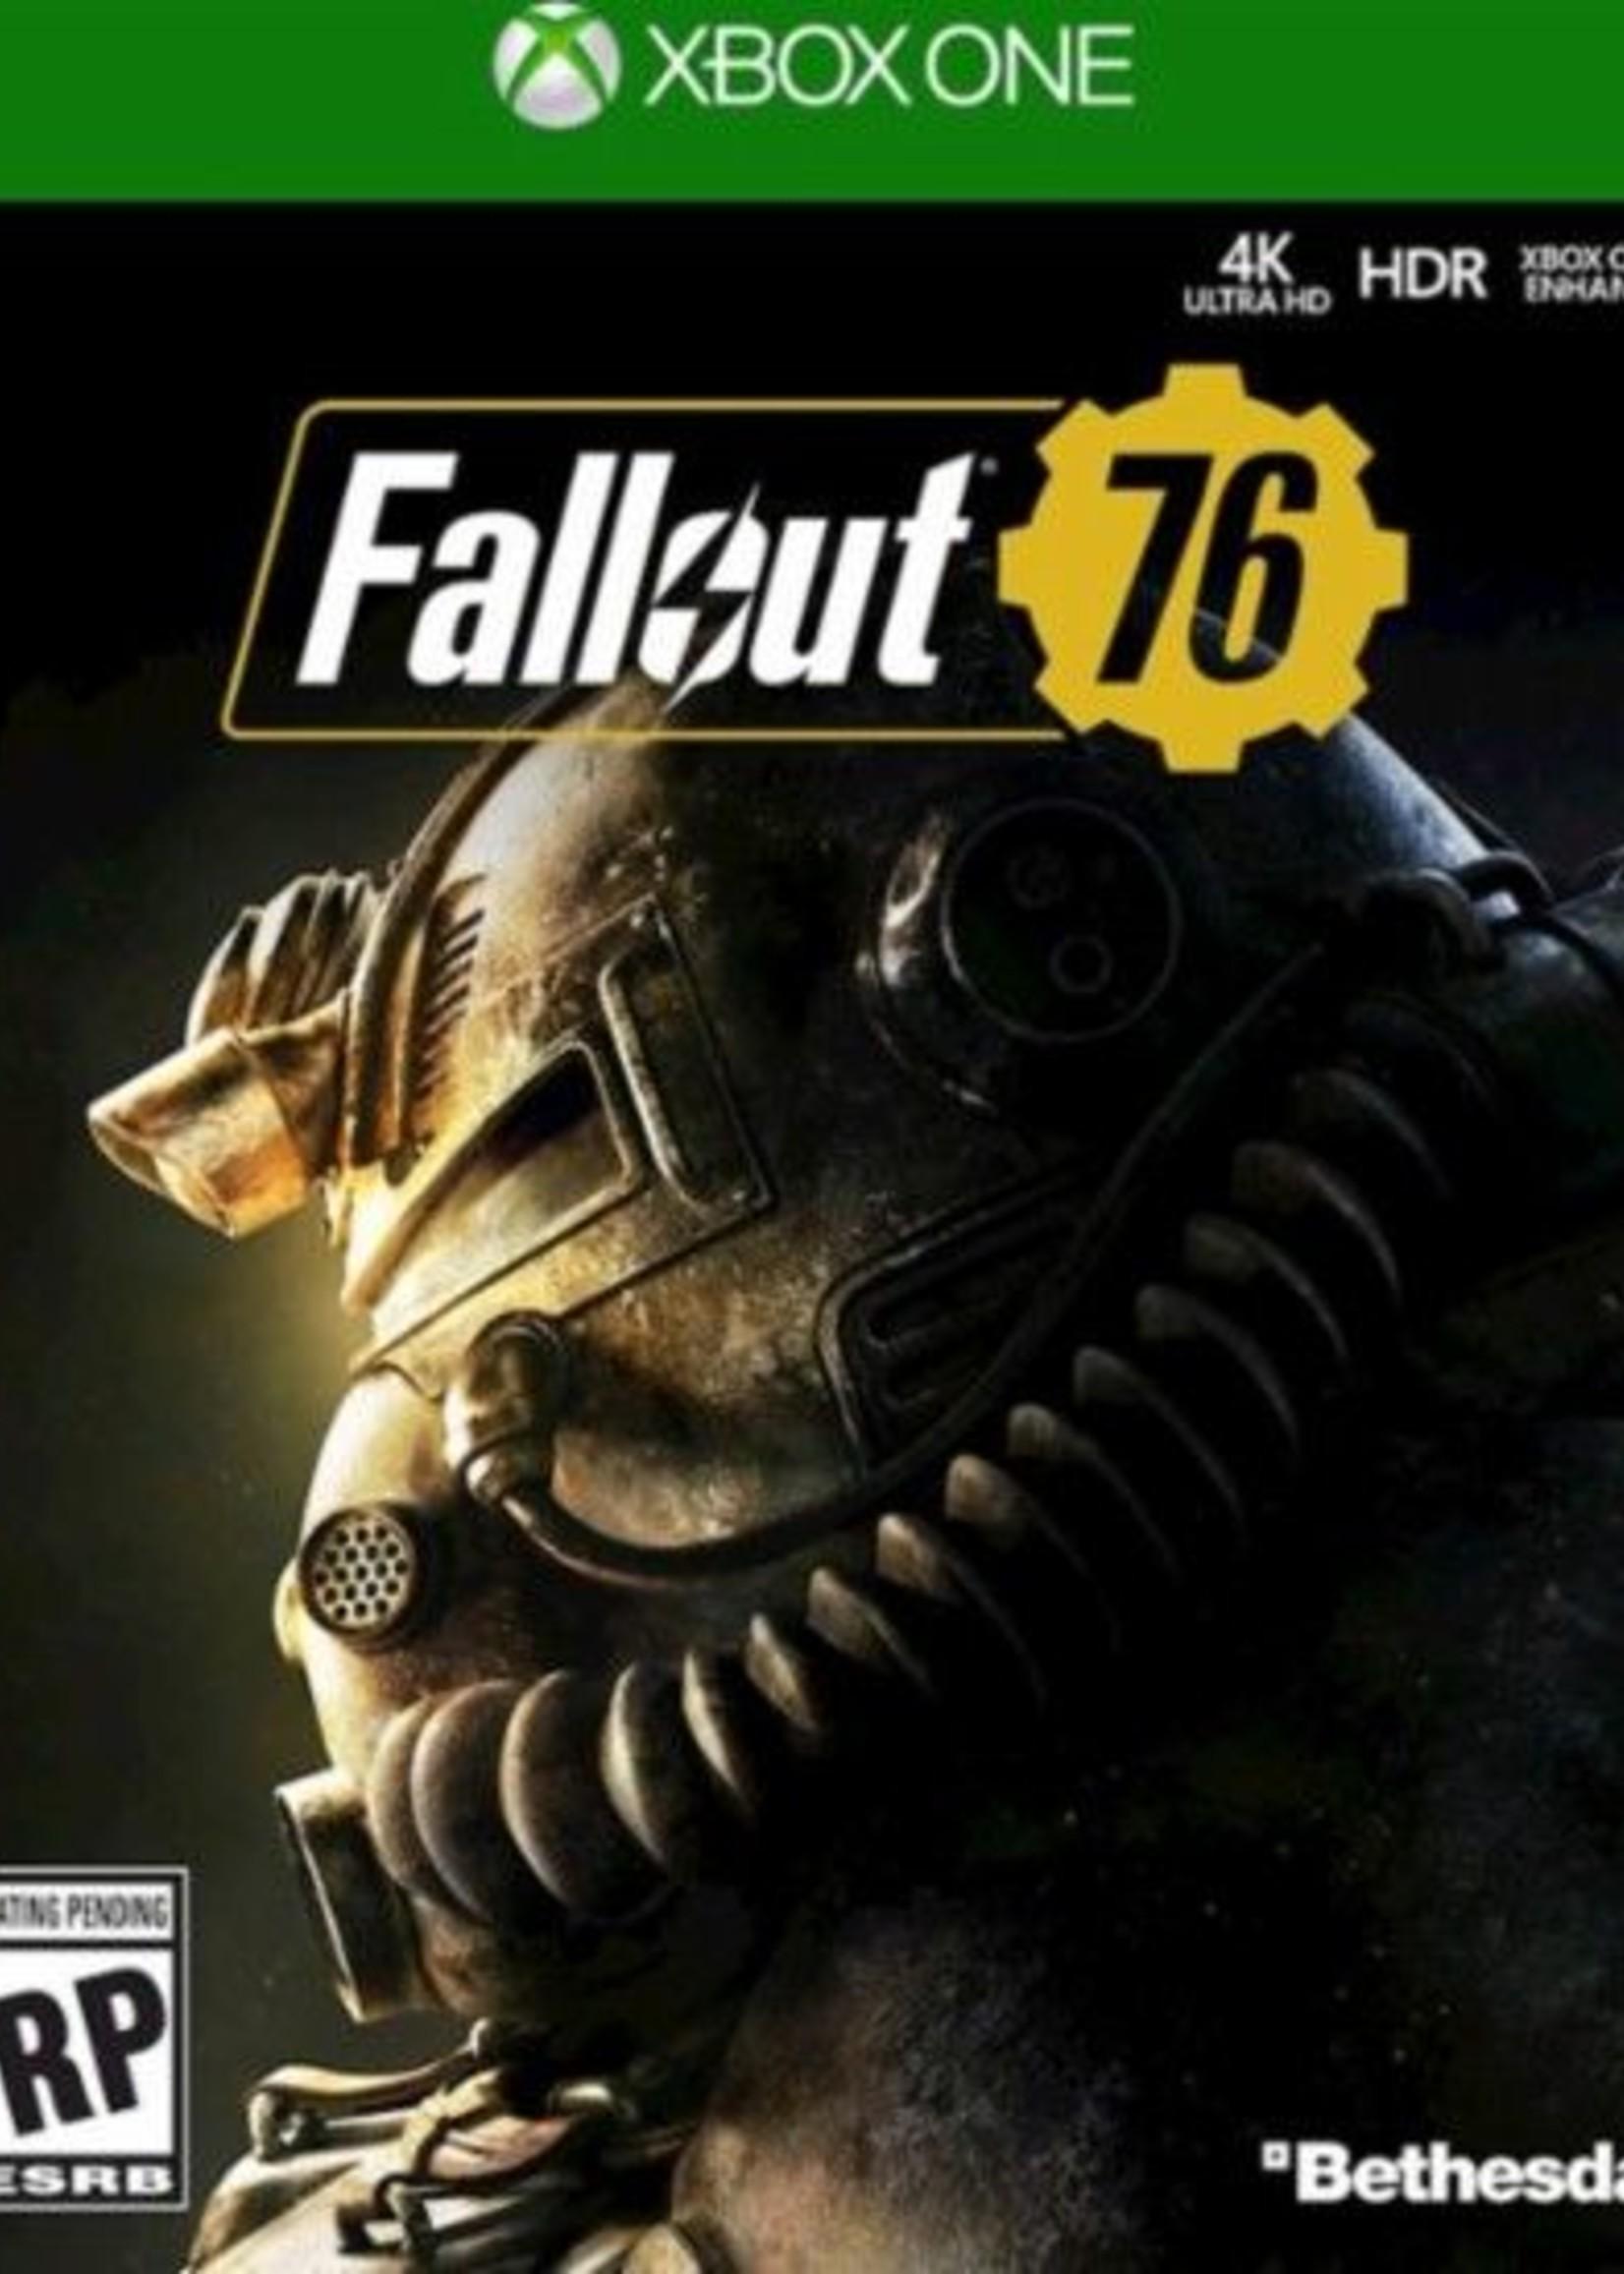 Fallout 76 - XBOne NEW